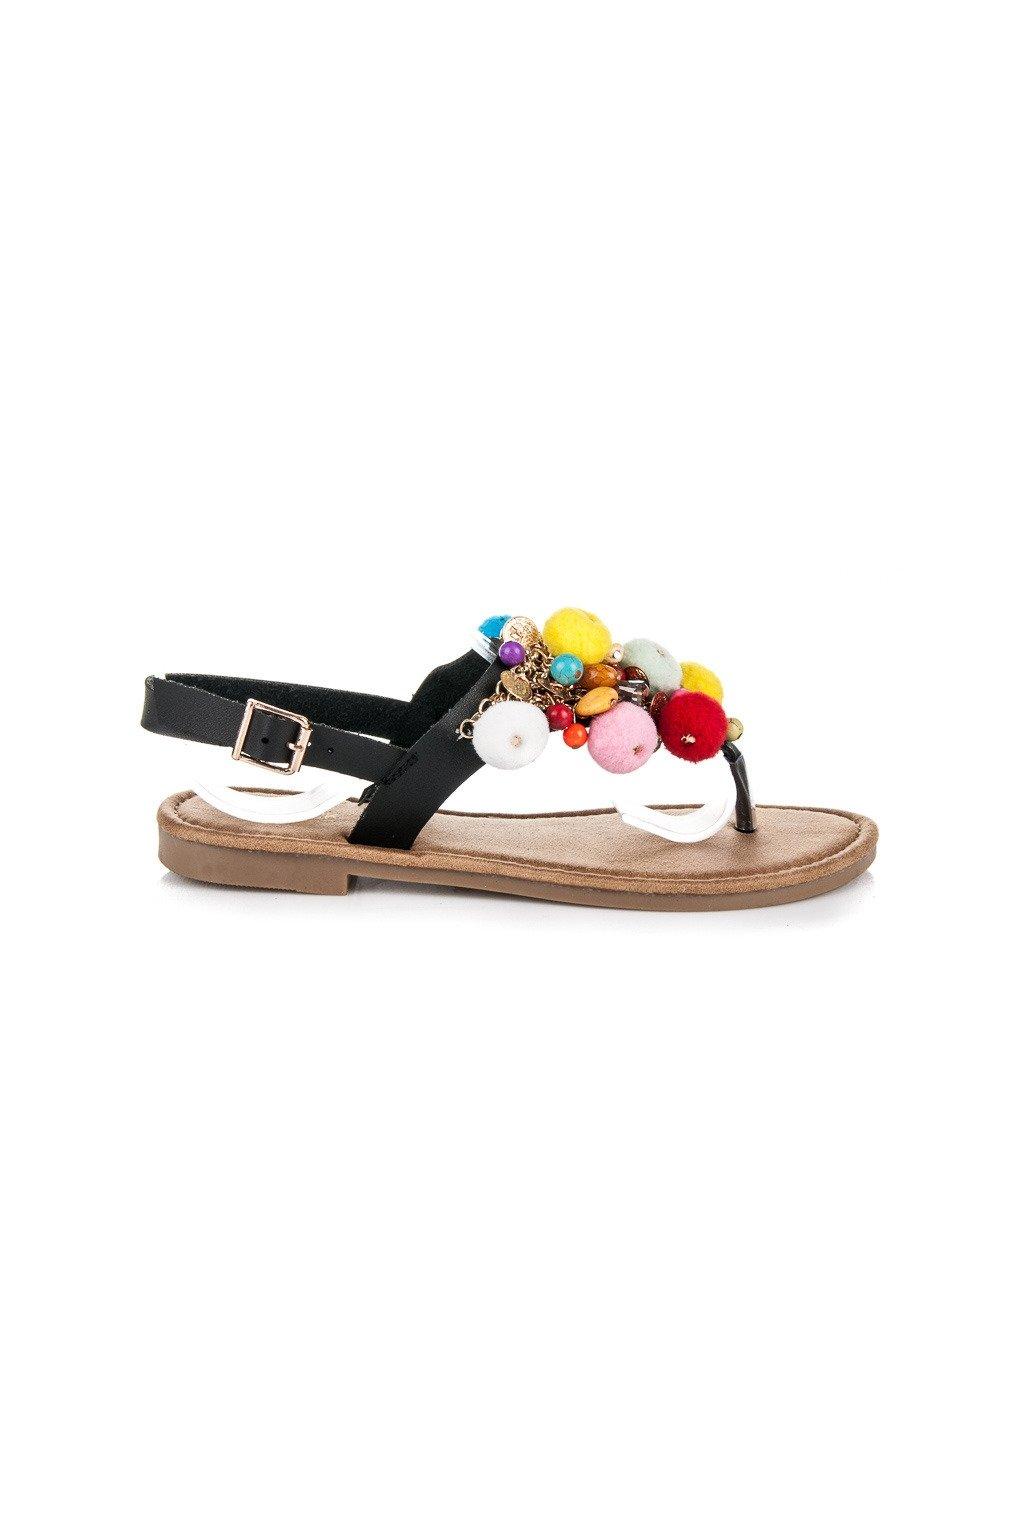 Čierne sandále s brmbolcami JTT-5B 11dd33b1330